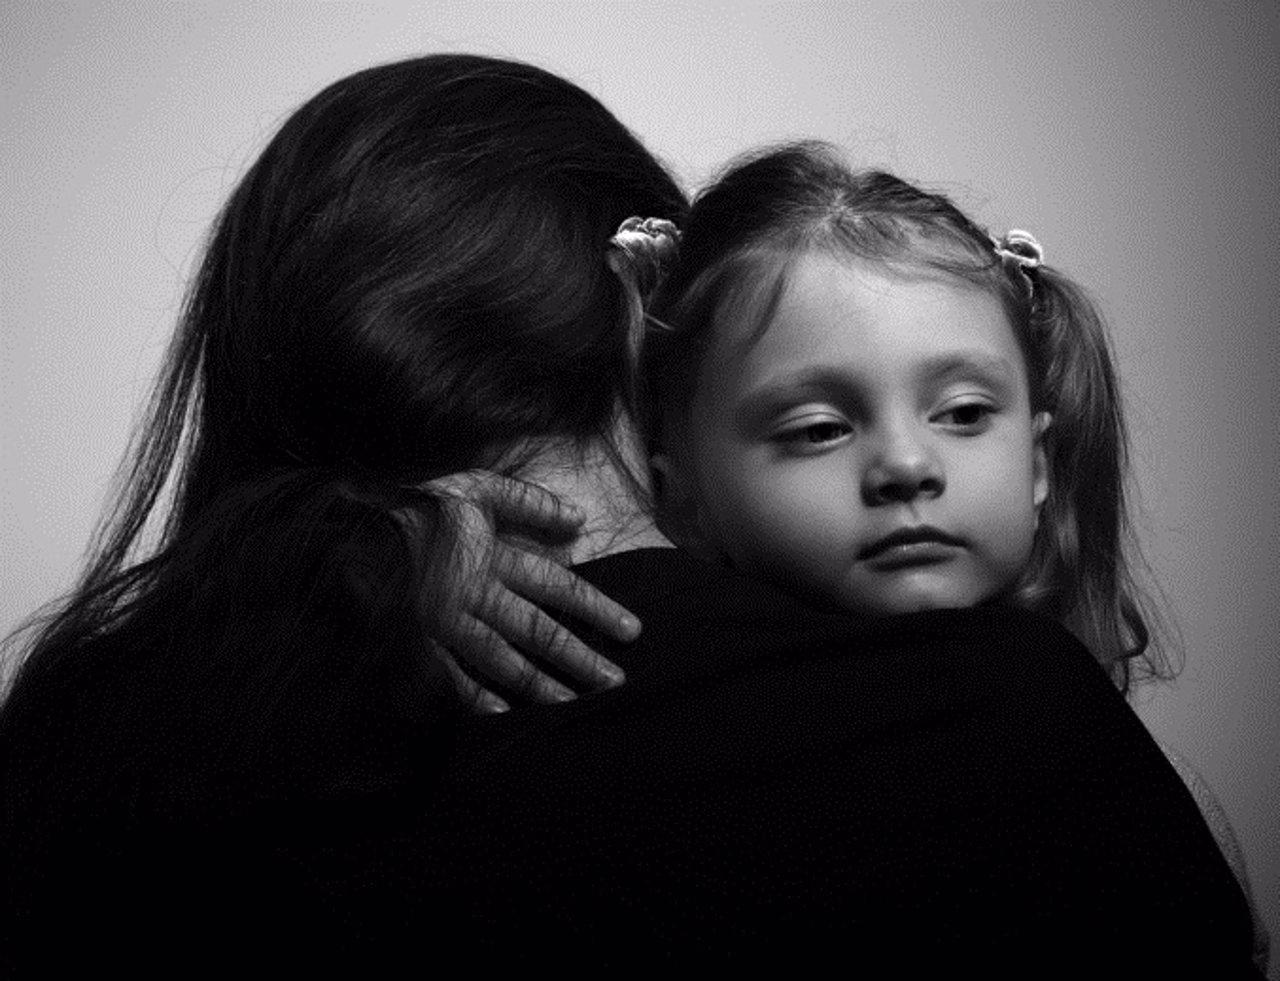 Depresión, madre e hija